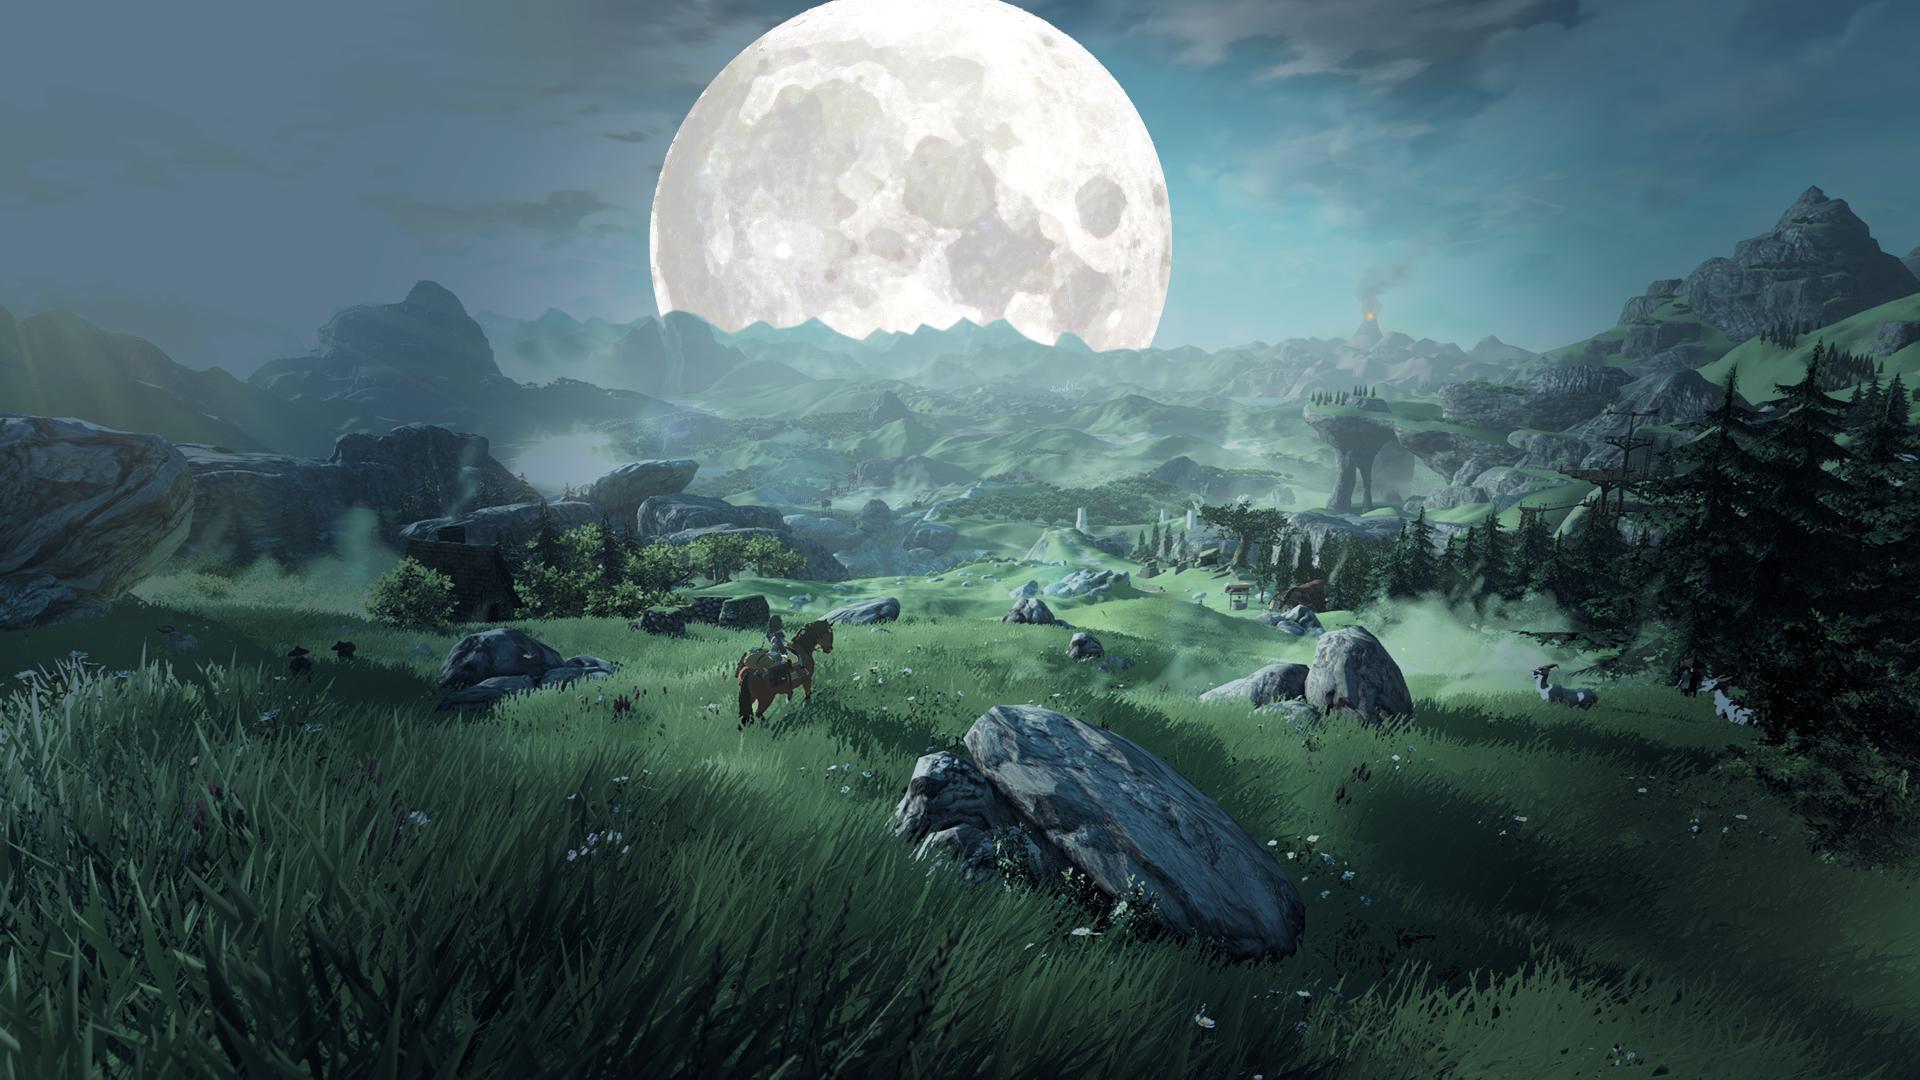 Assassins Creed 2 Hd Wallpapers Fondos De The Legend Of Zelda Breath Of The Wild Wallpapers